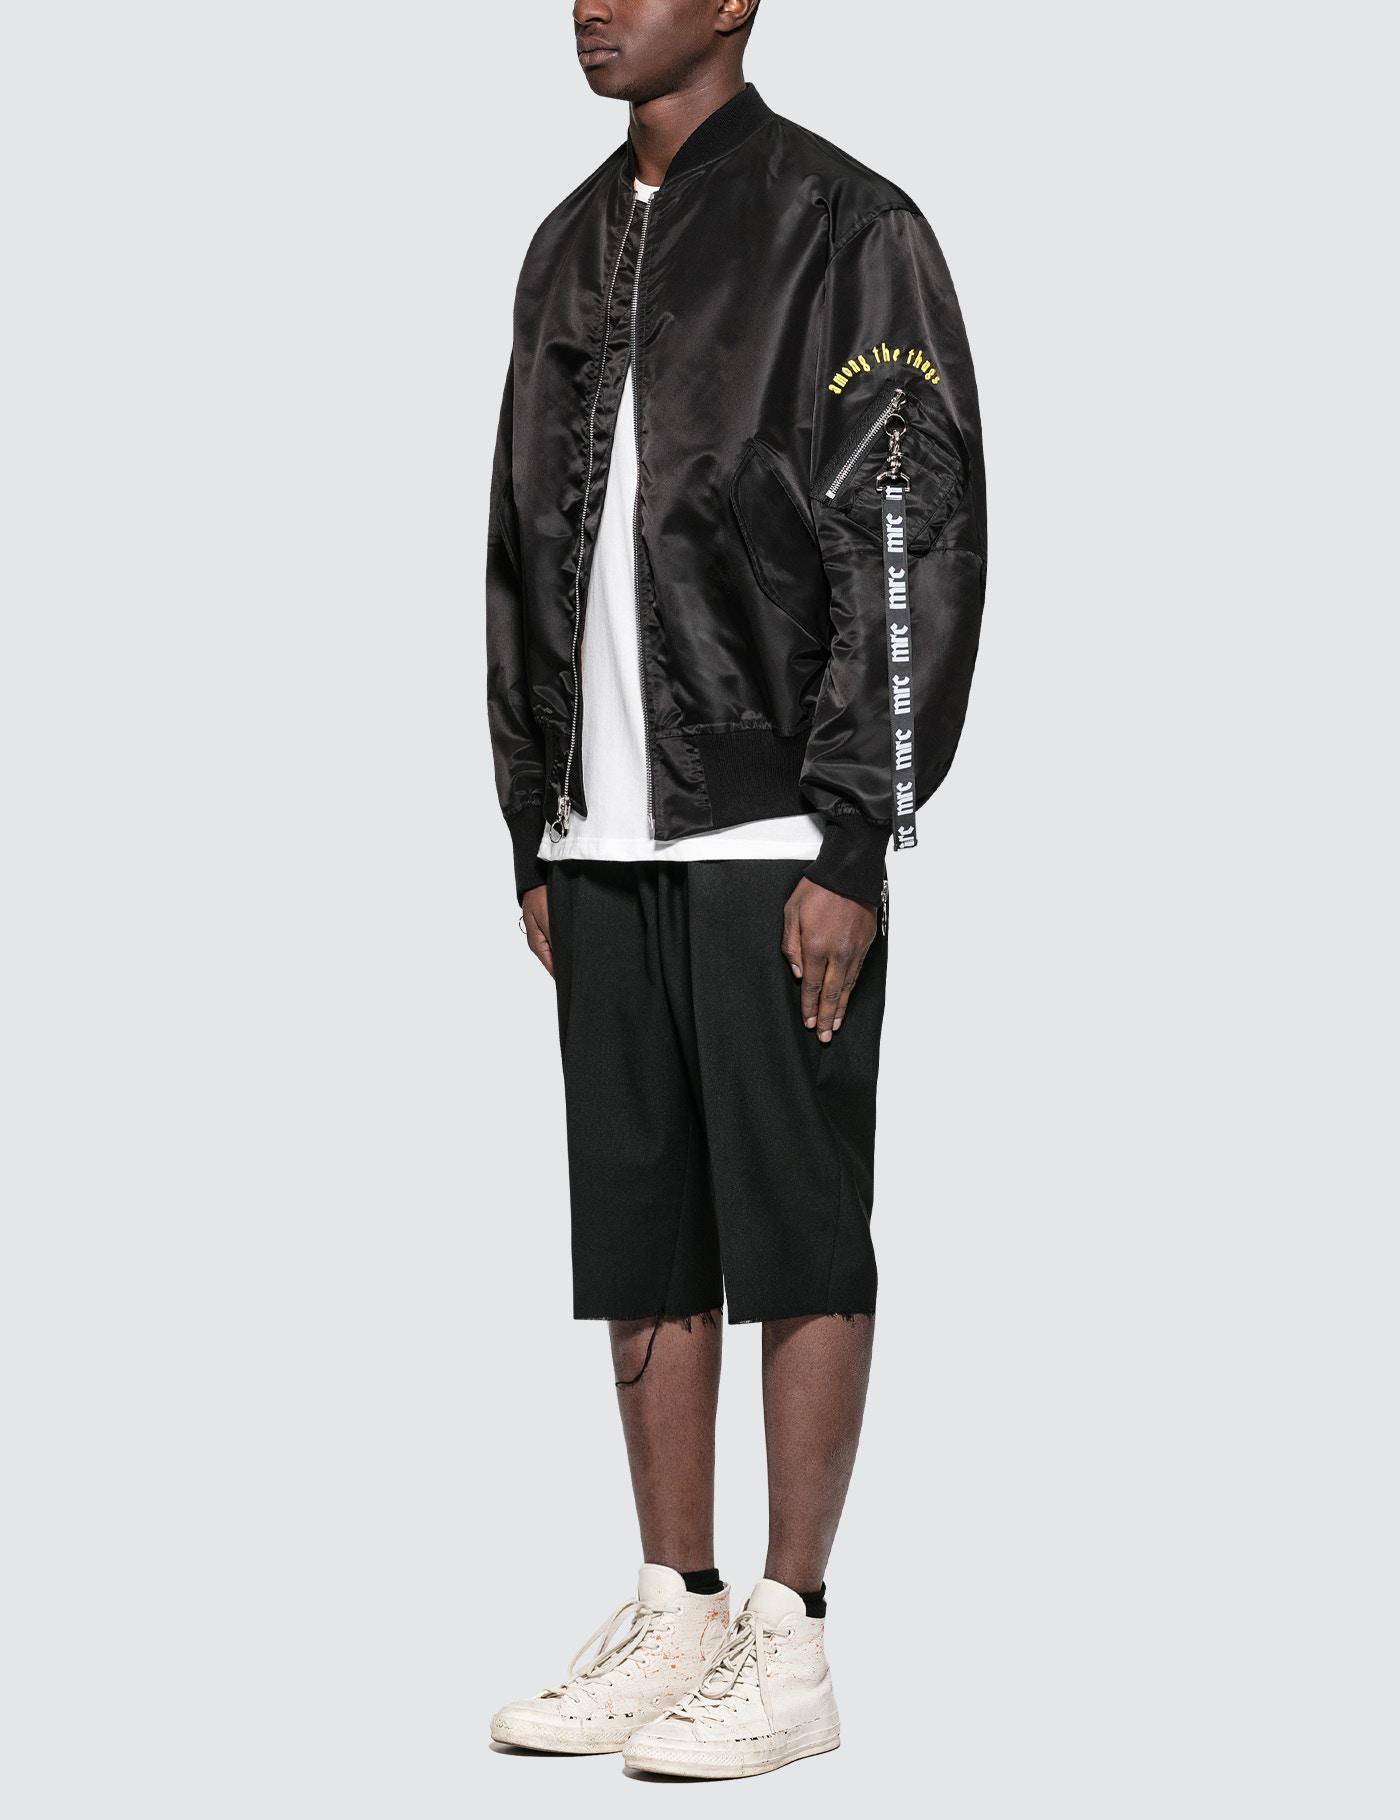 MR. COMPLETELY Cotton Anger Bomber Jacket in Black for Men